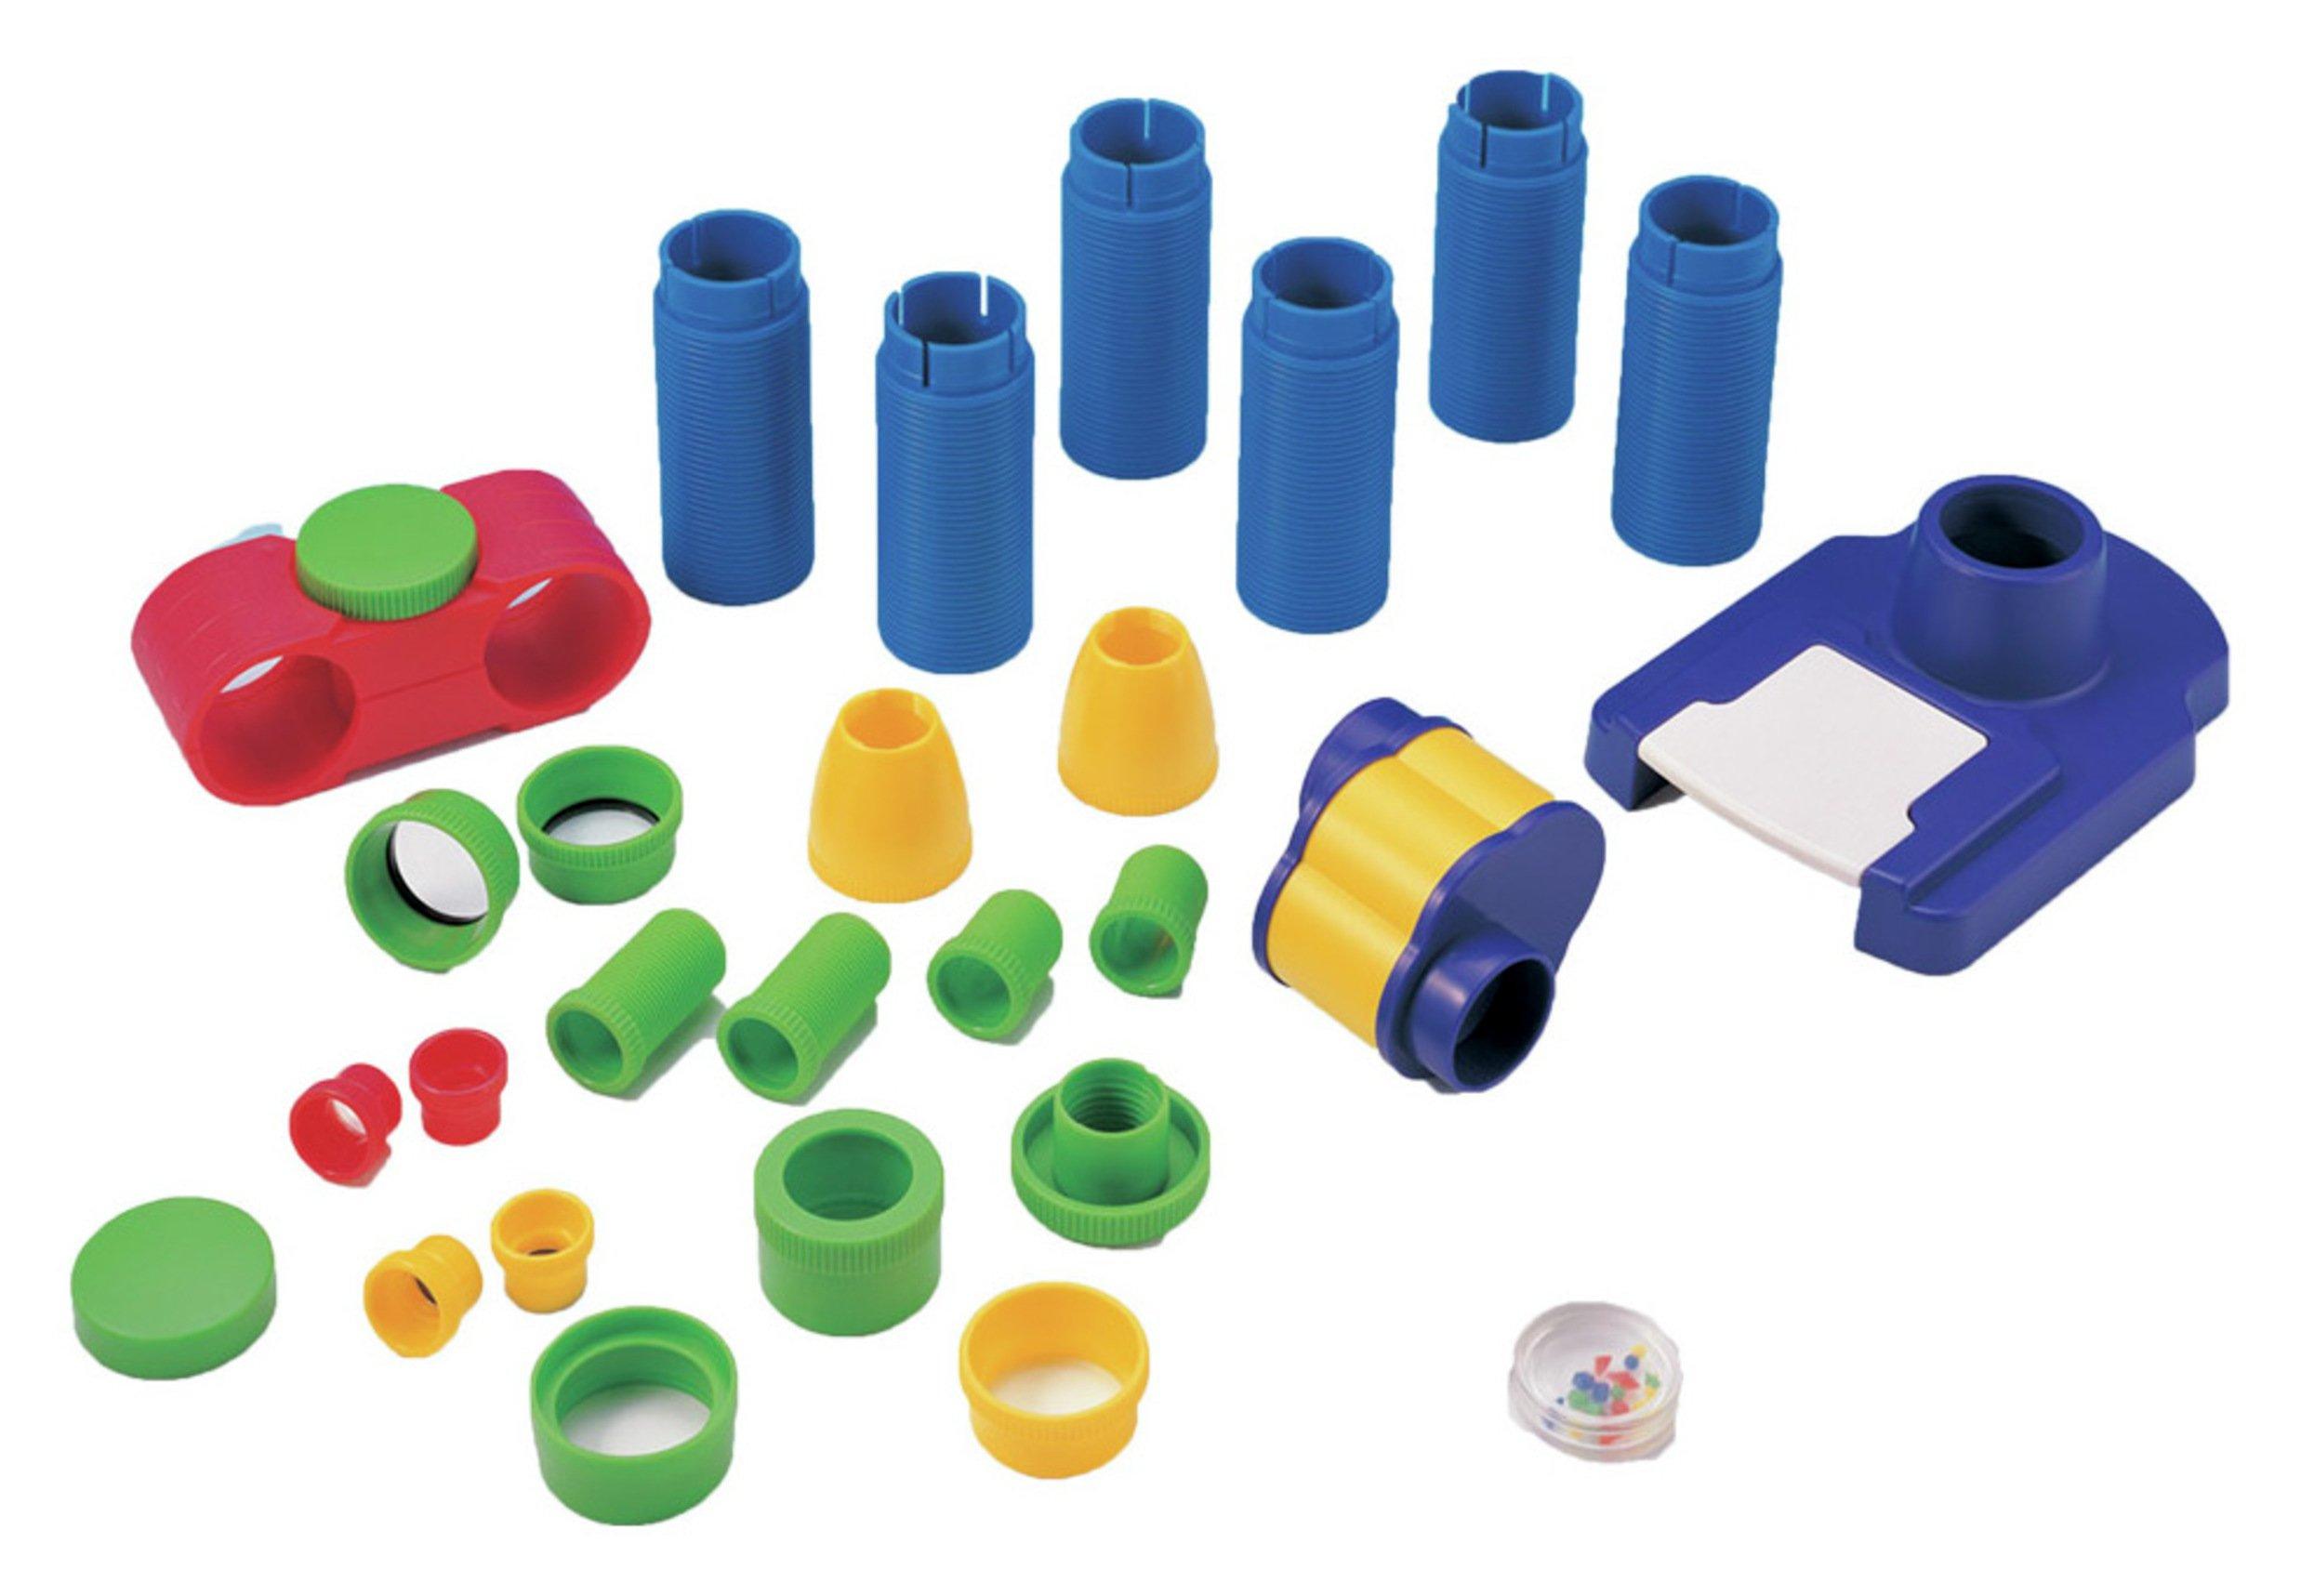 Image of Multioptics Zoom Kit